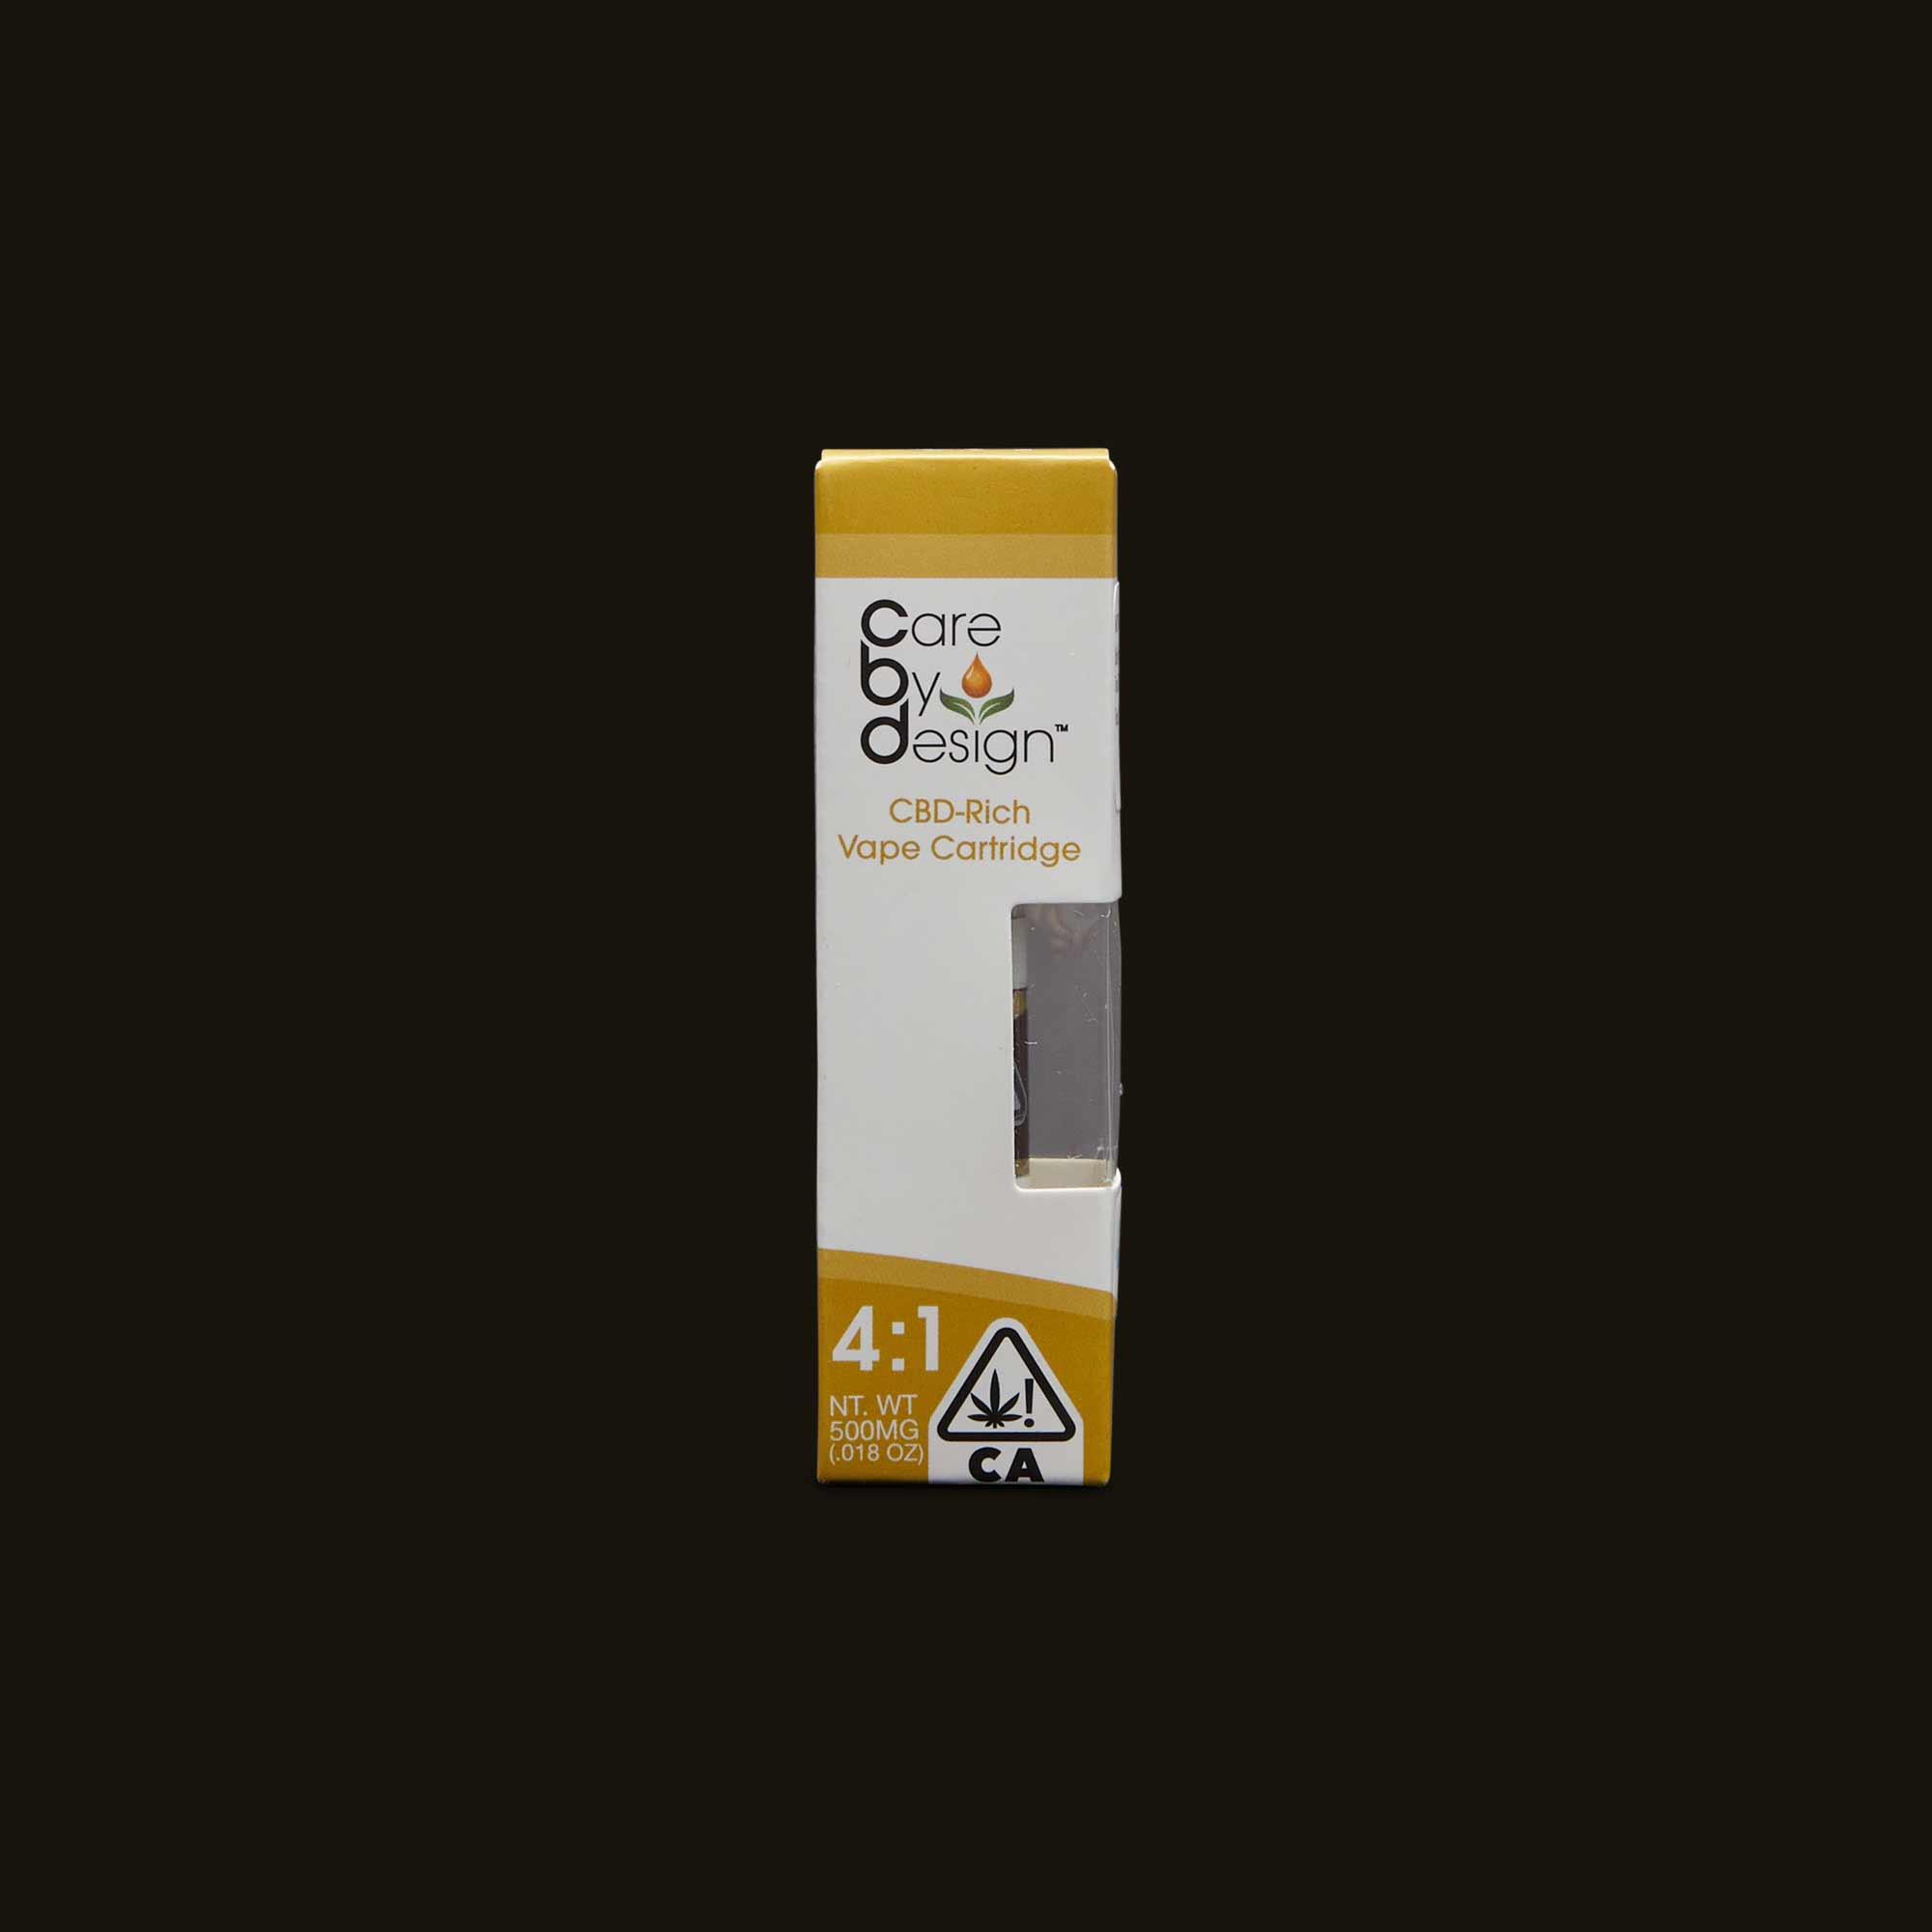 Care By Design 4:1 Vape Cartridge